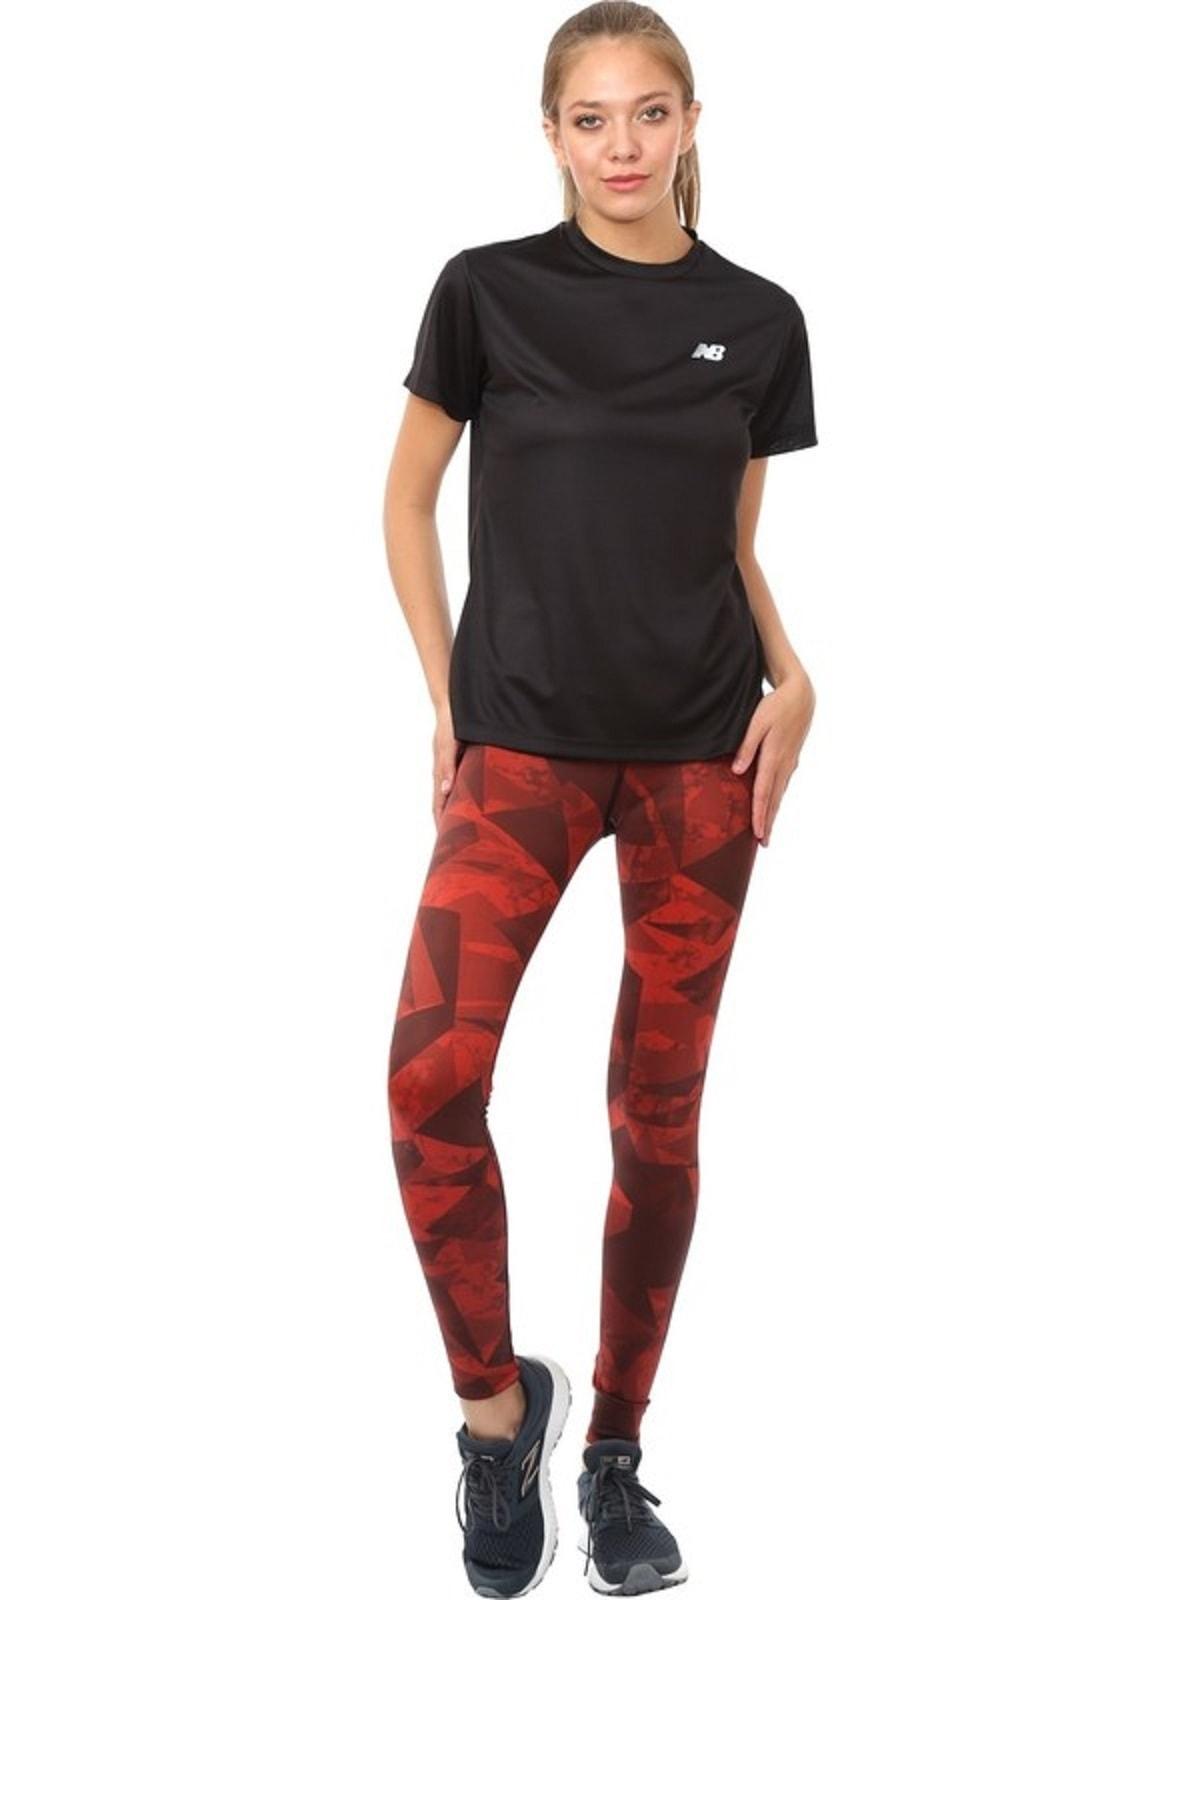 New Balance Kadın Spor T-Shirt - NB VOM TEE - NBTM009-BK 1